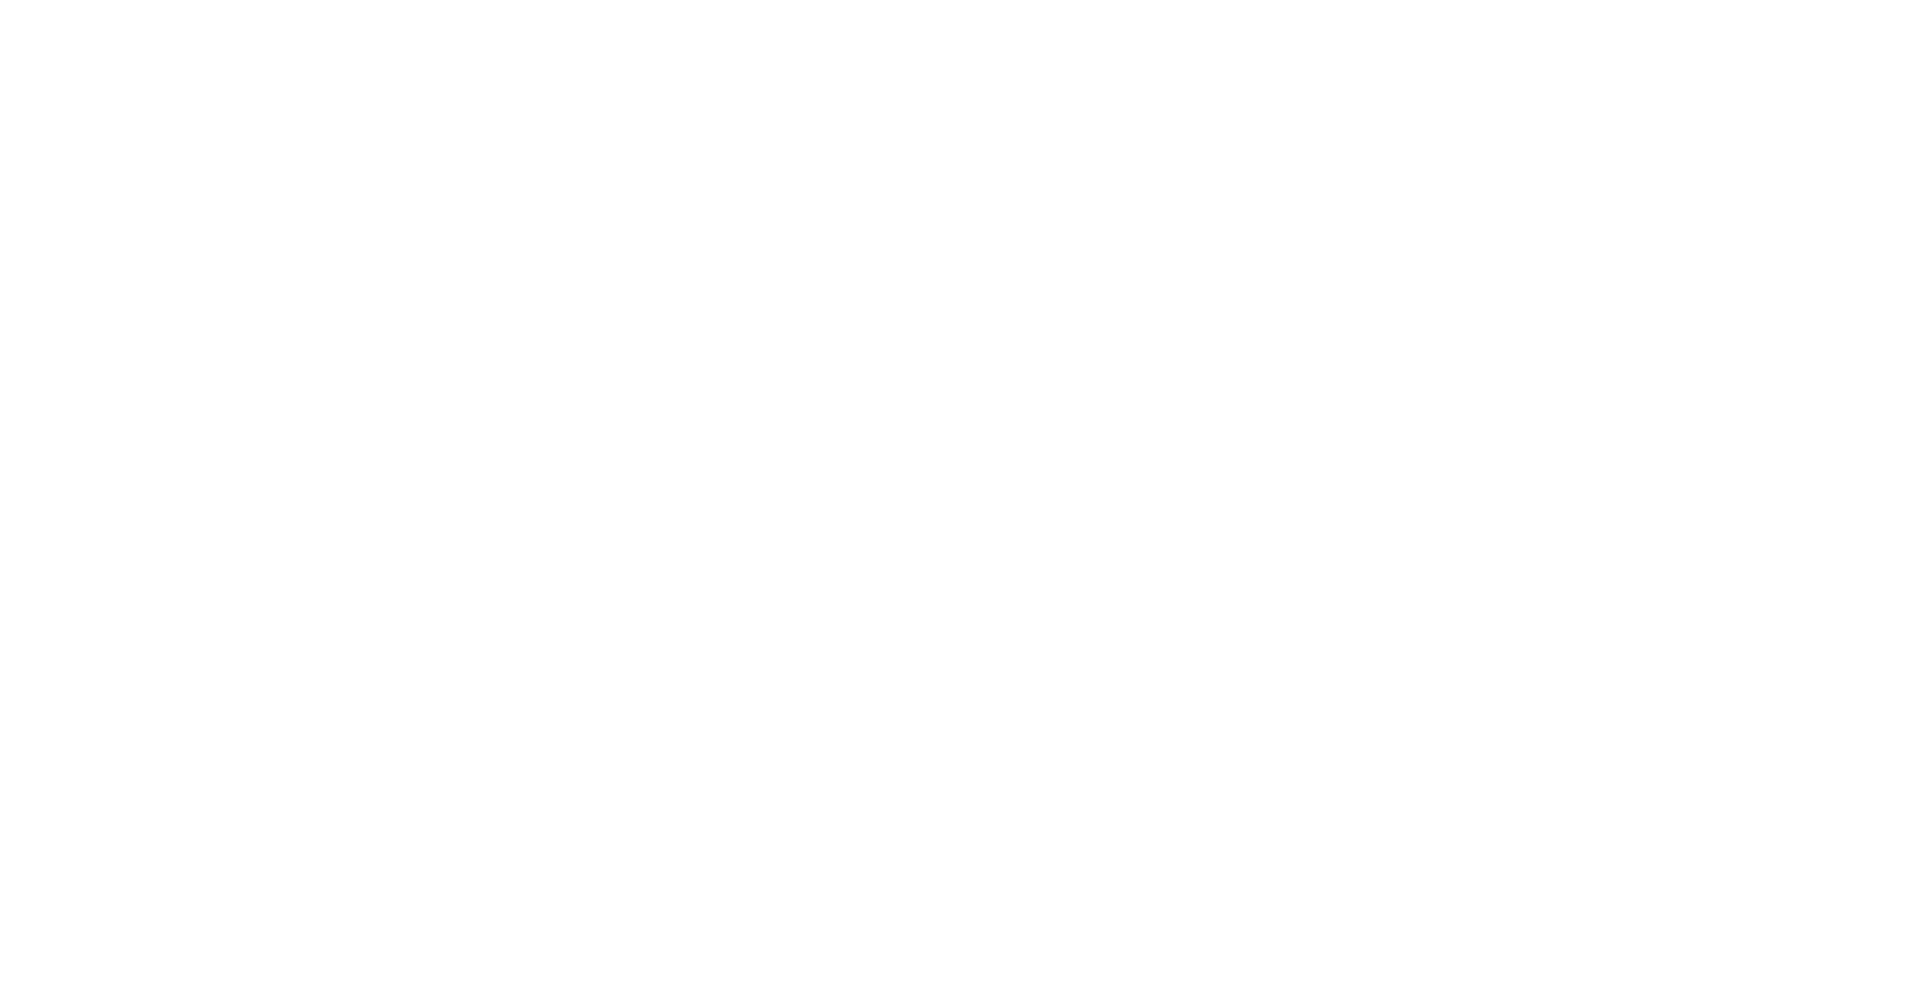 test-image